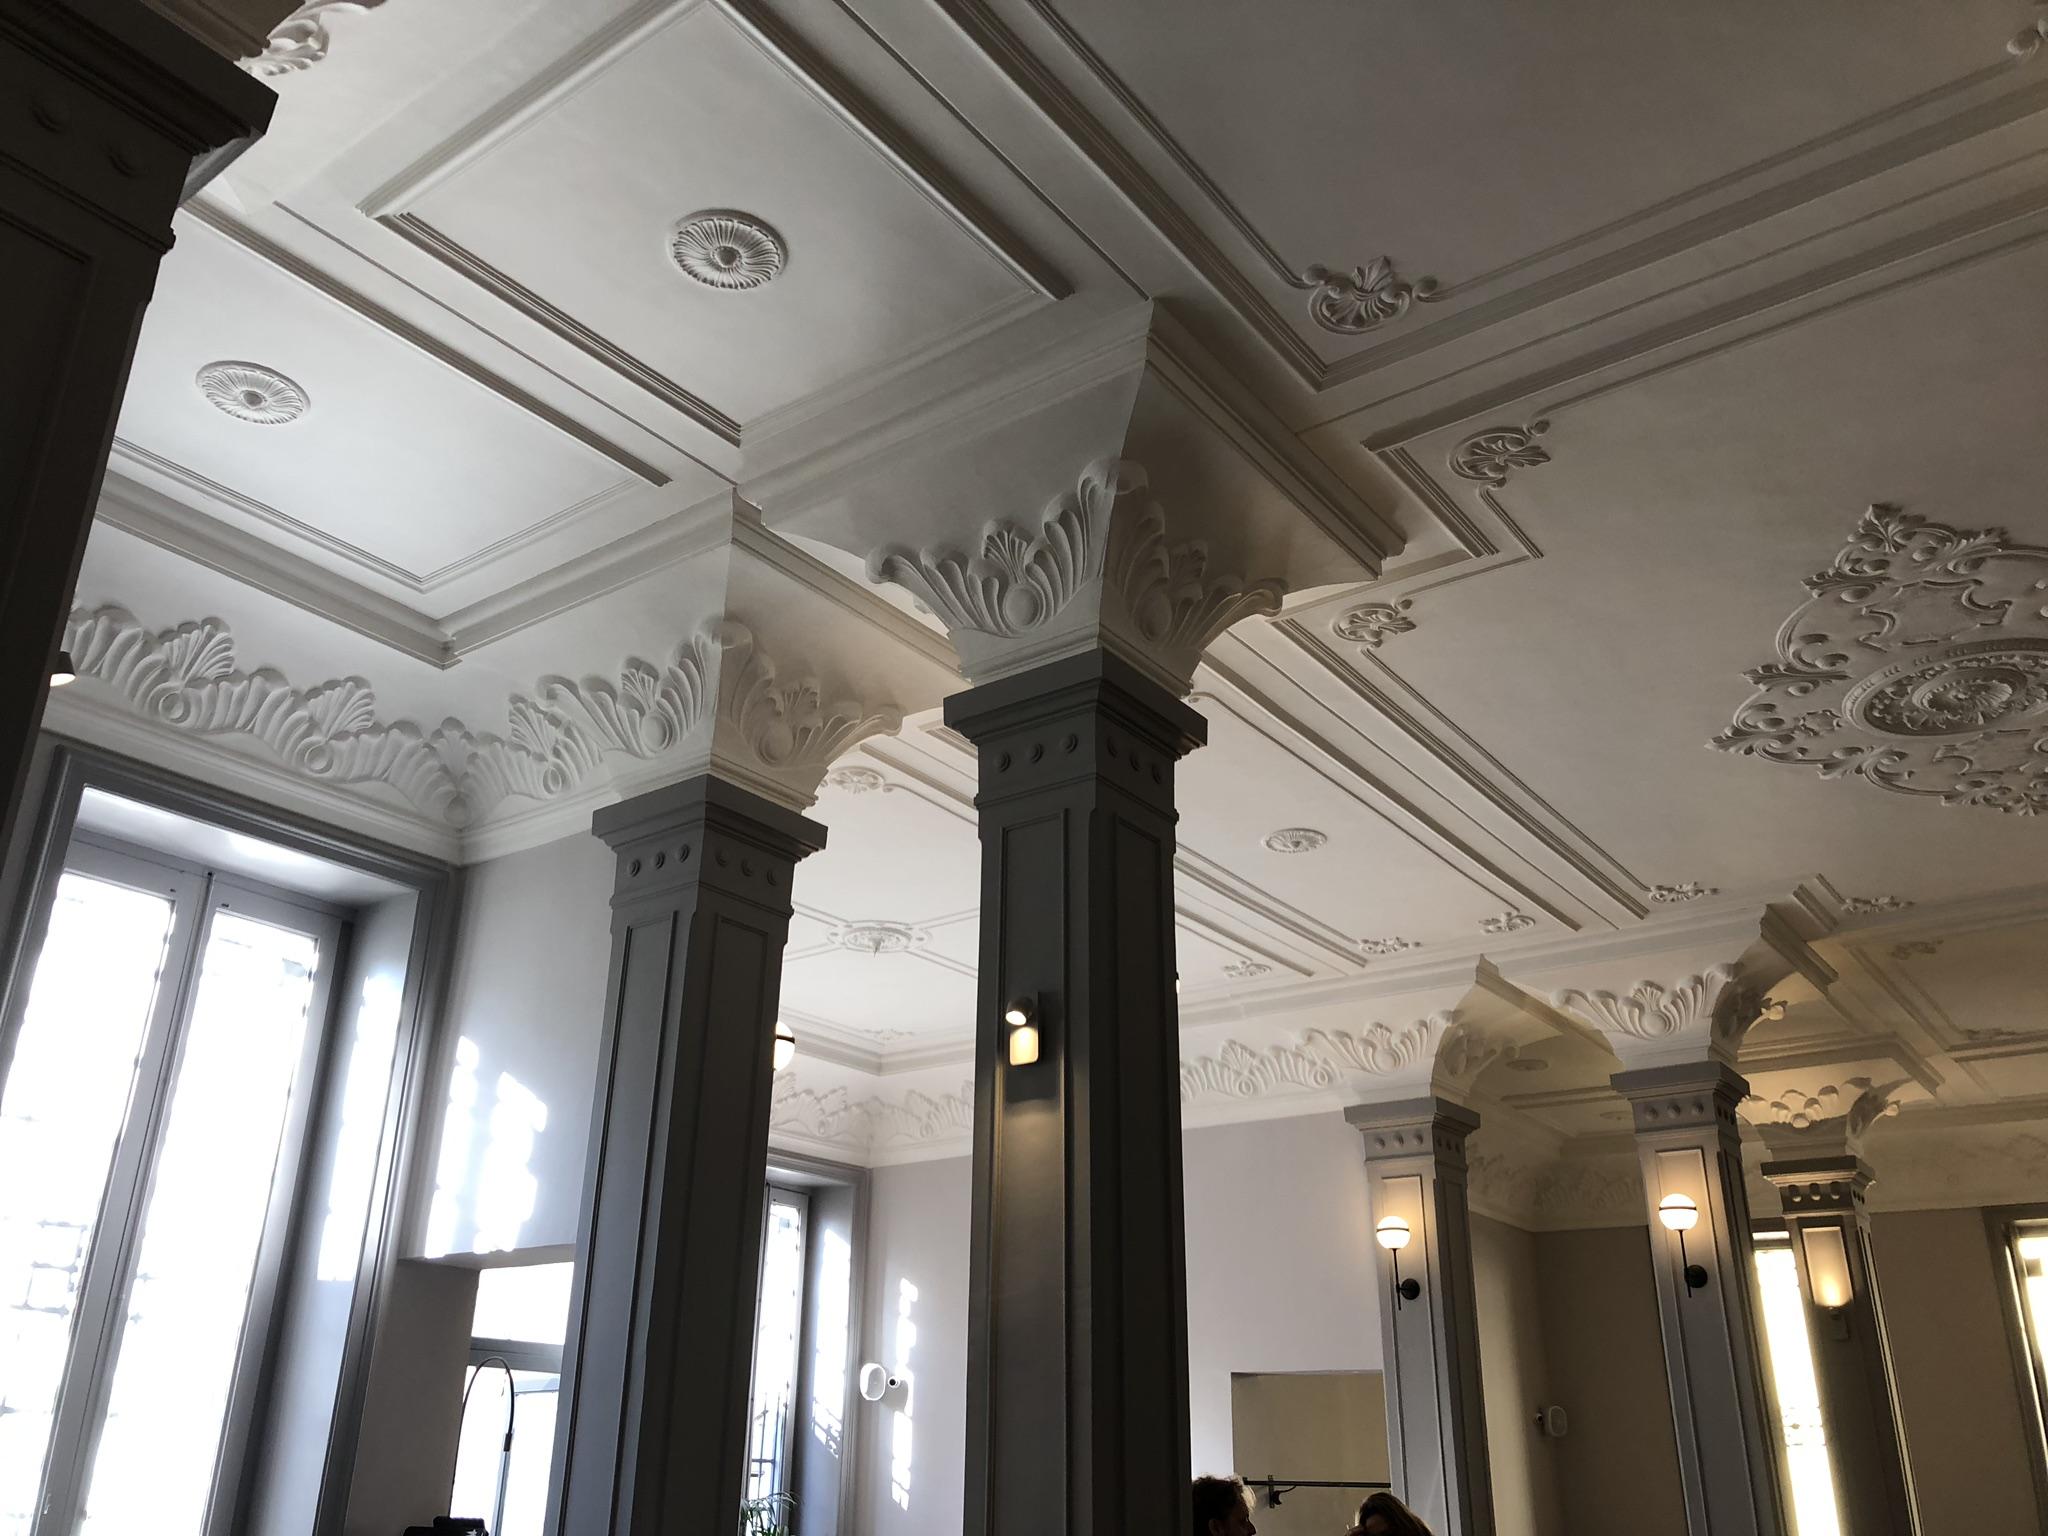 Ristorante La Banca Galatina interni